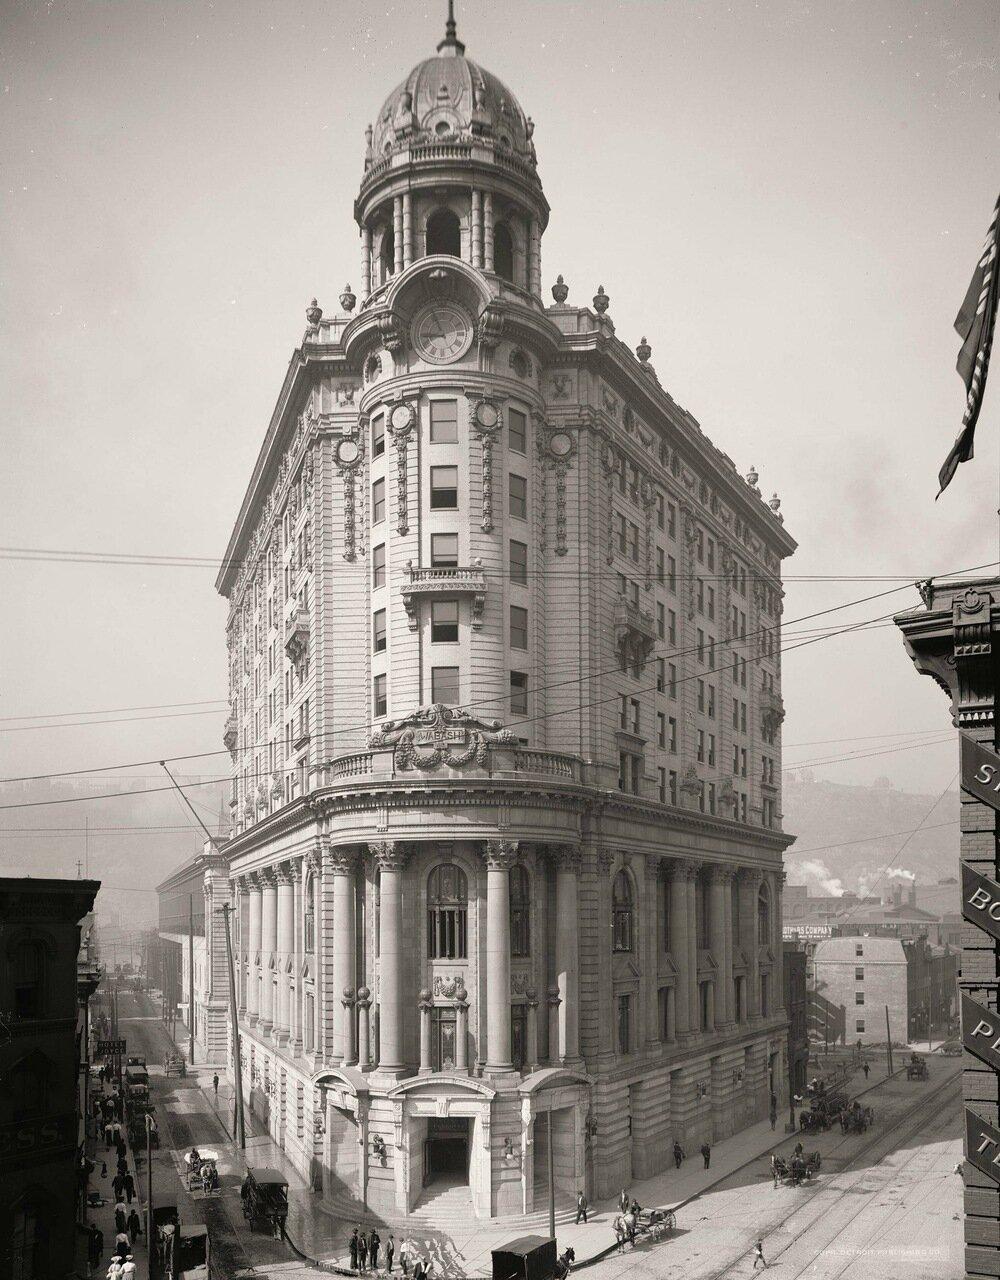 Станция Уобаш, Питтсбург, примерно 1905 г.